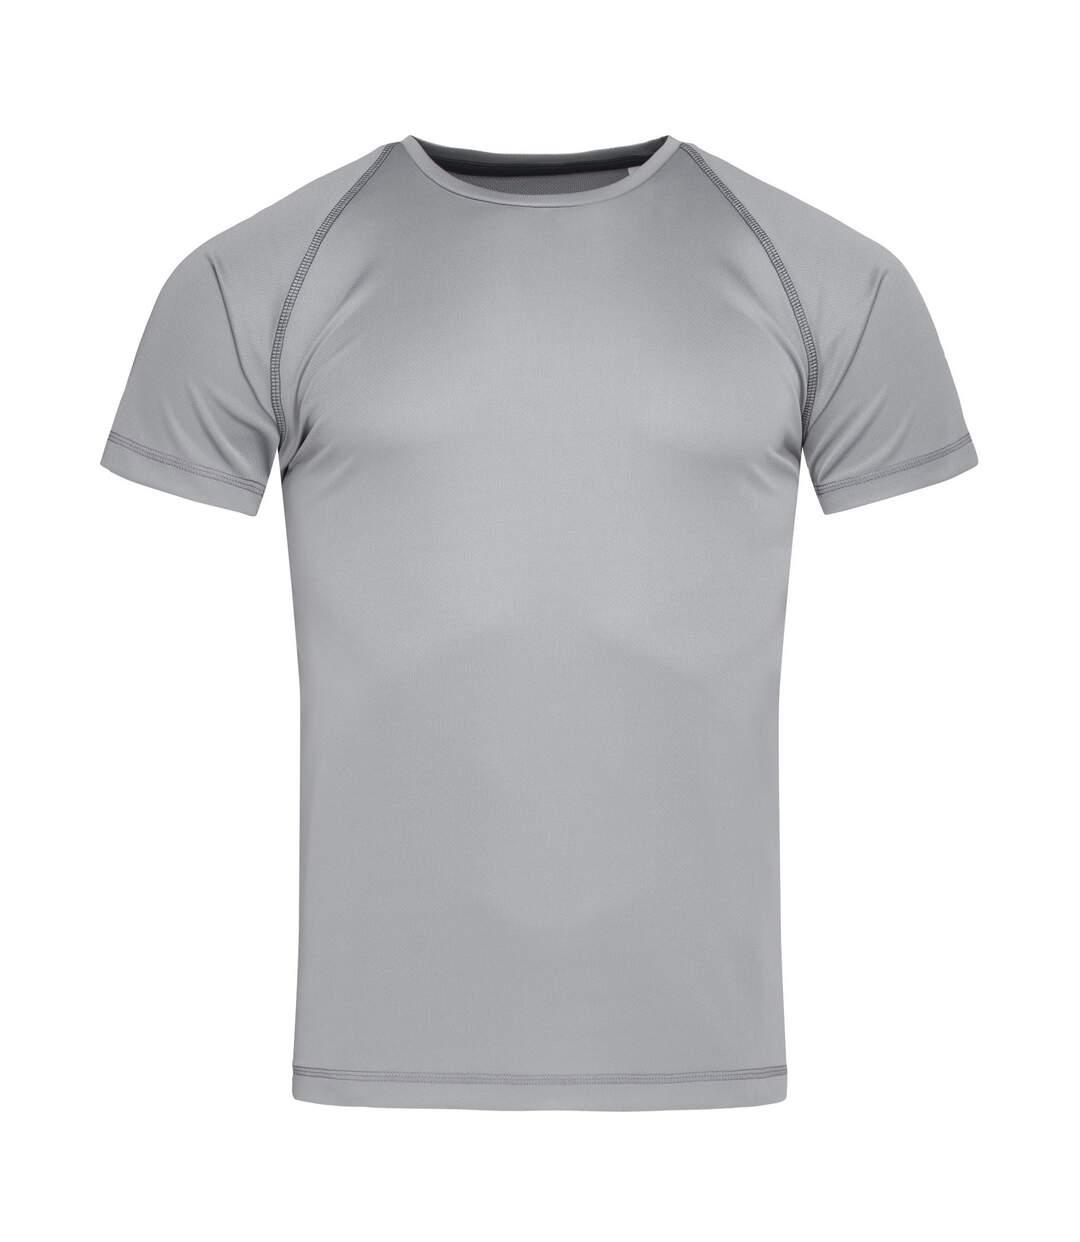 Stedman Mens Active Raglan T-Shirt (Silver Grey) - UTAB459